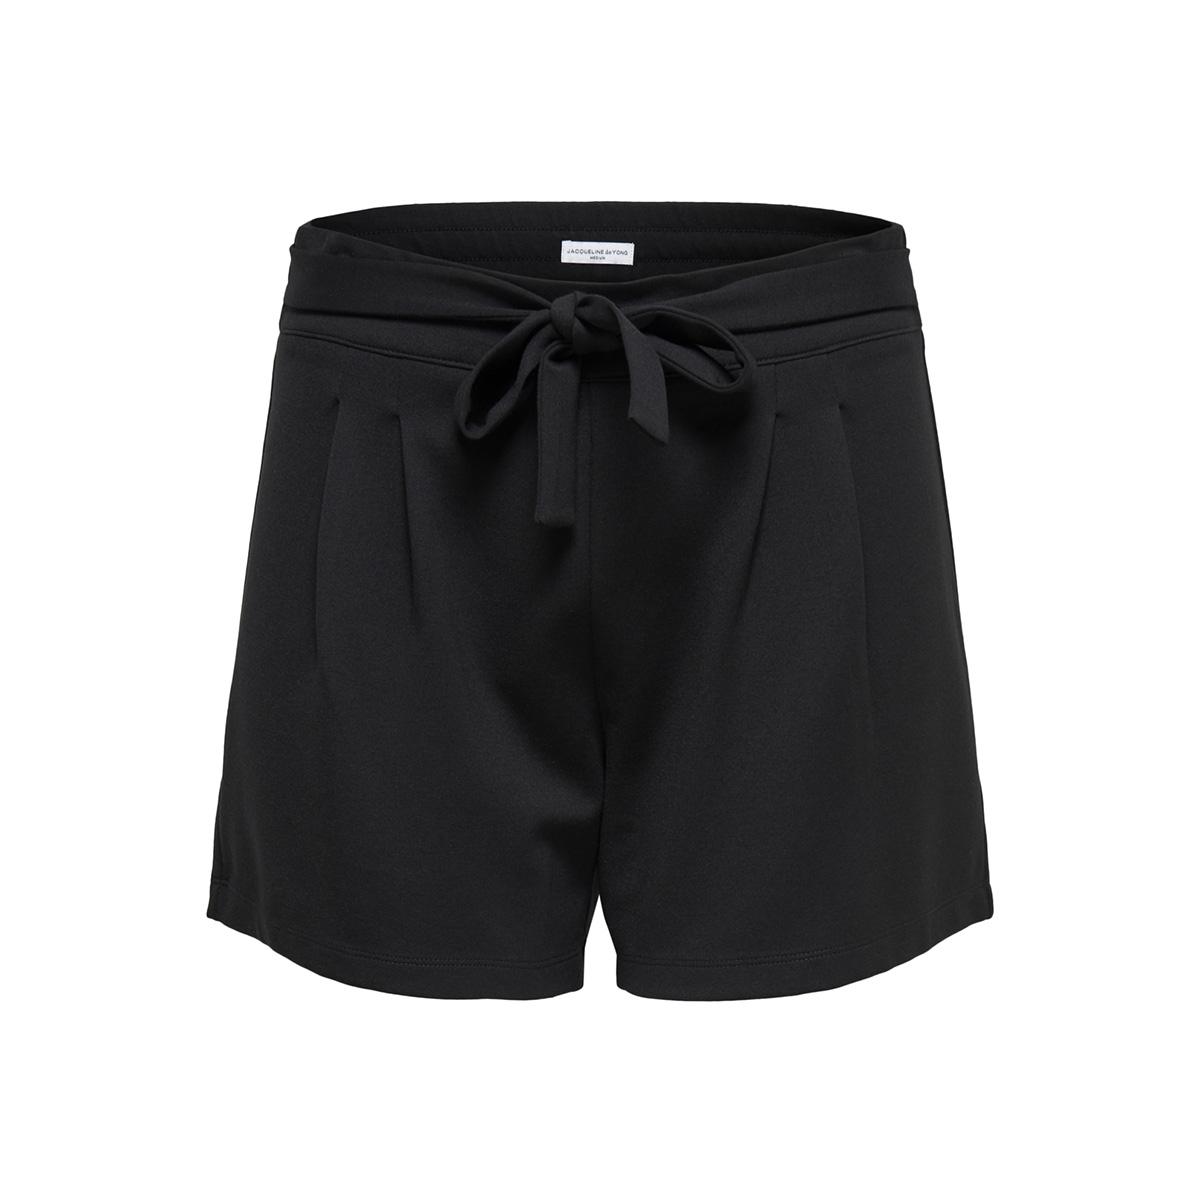 jdycurley nw shorts jrs 15153121 jacqueline de yong korte broek black